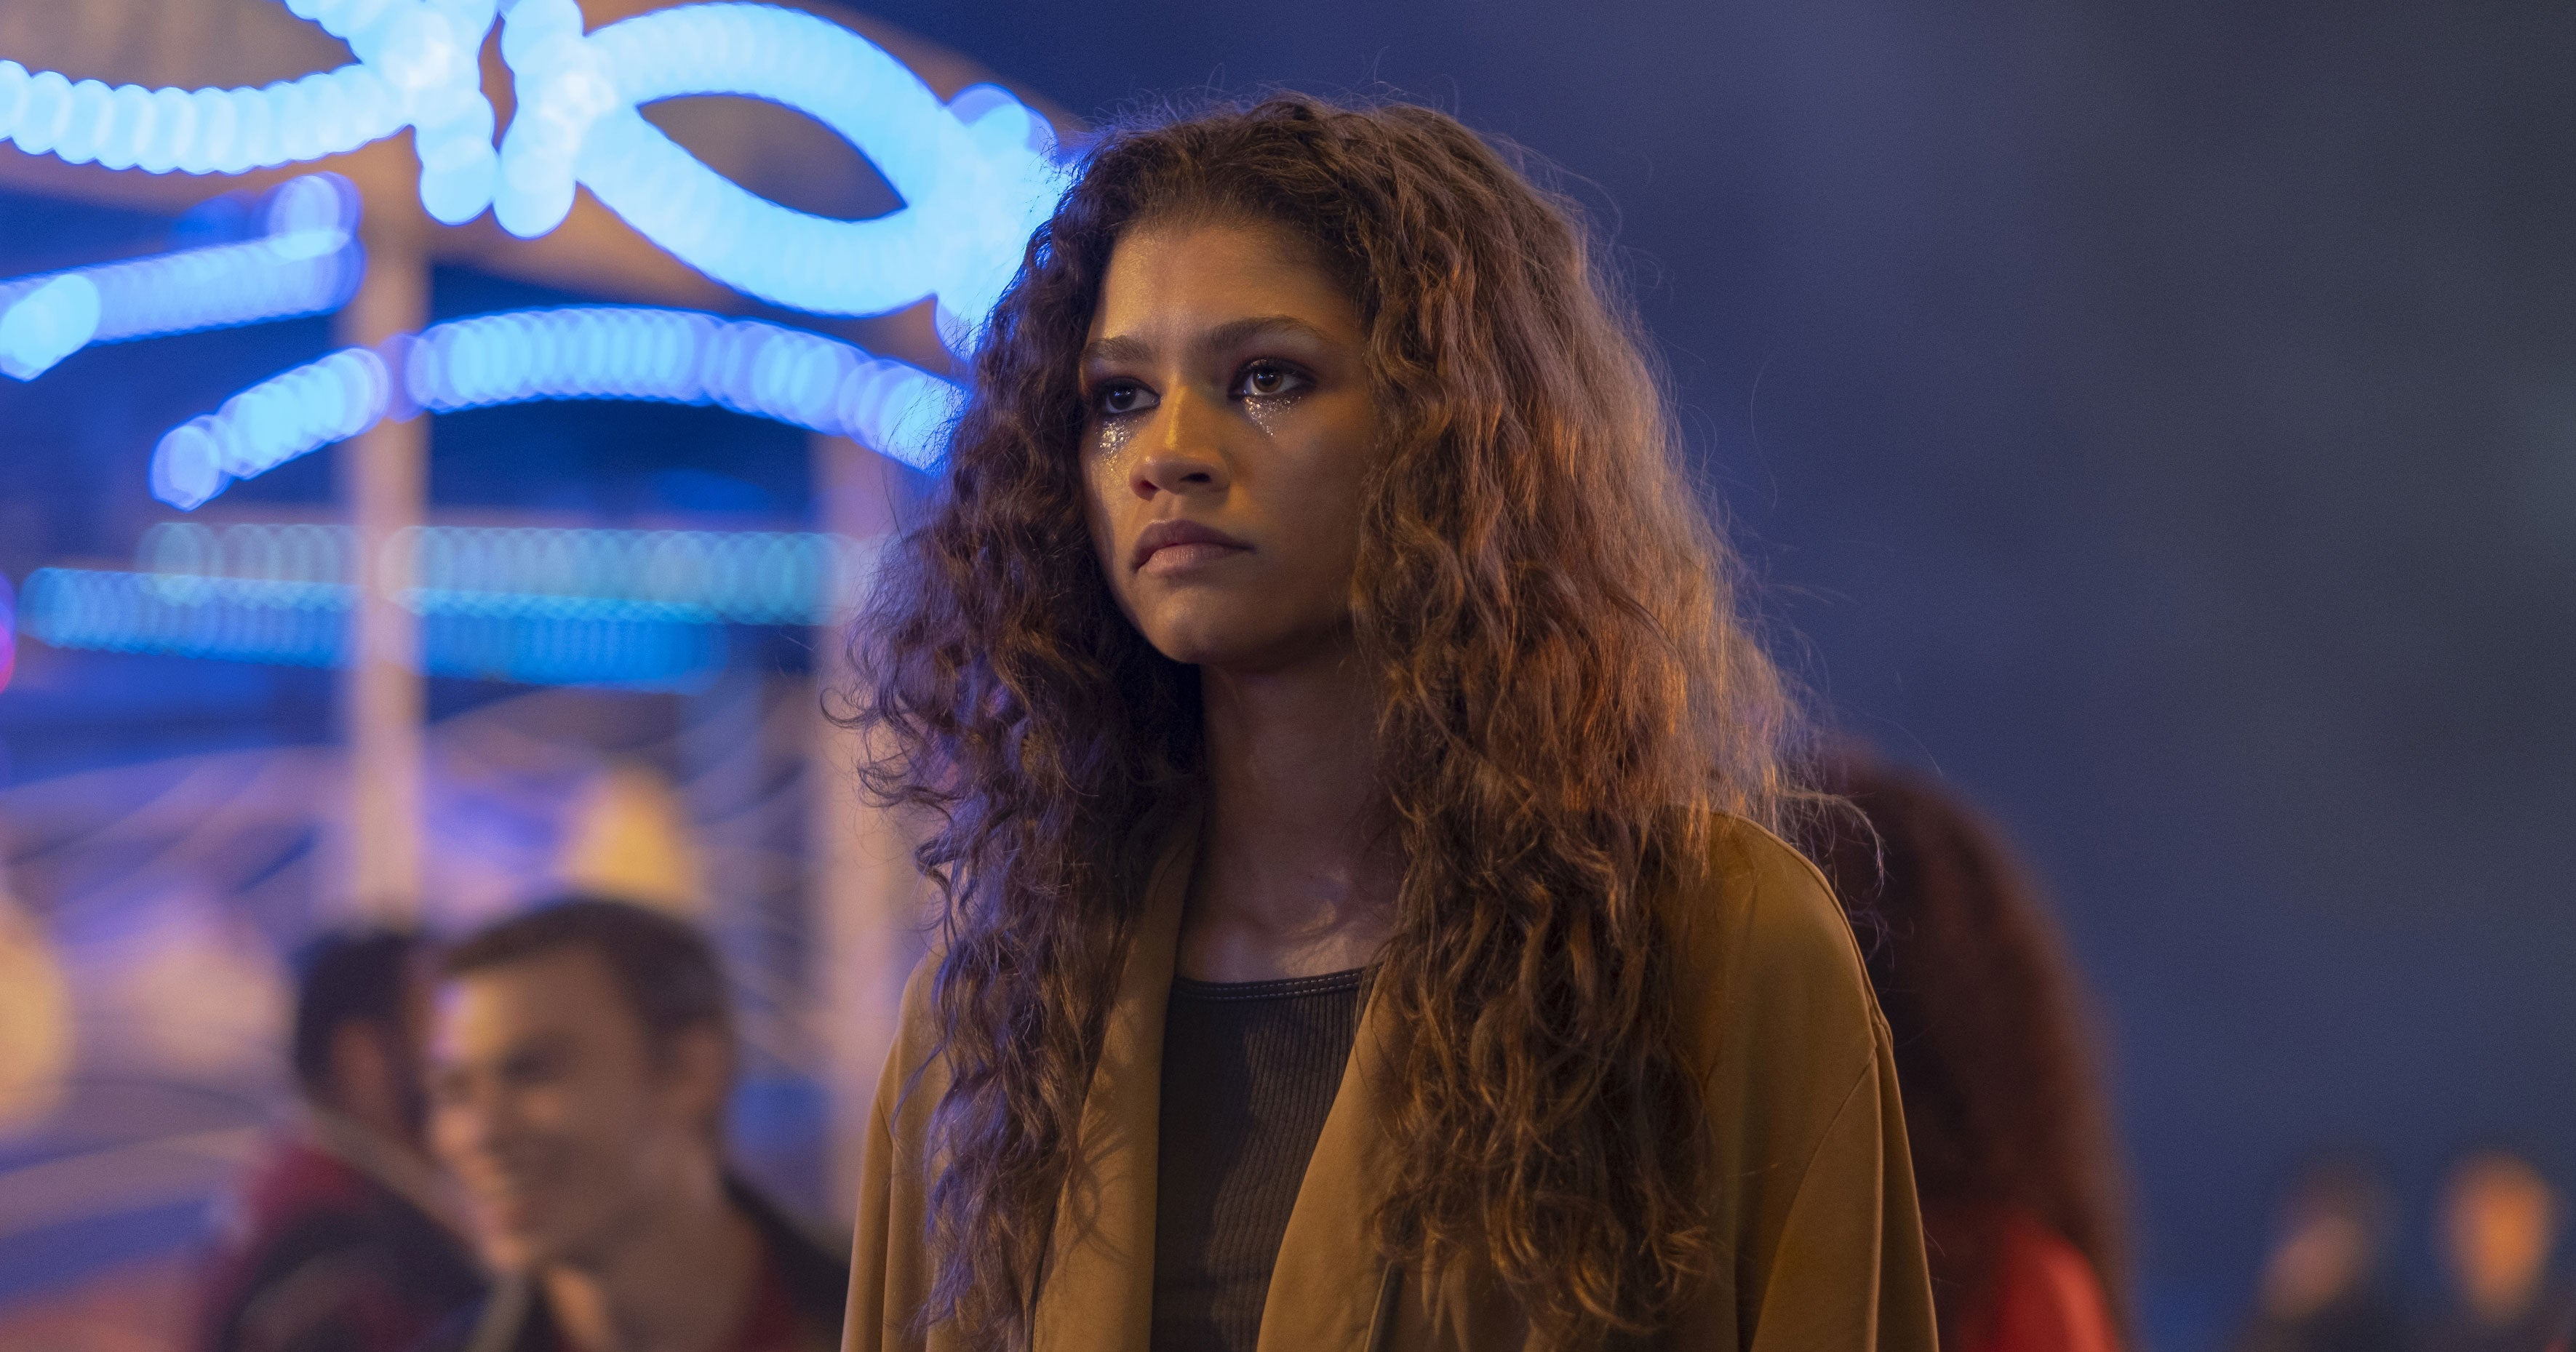 Euphoria Season 2 Is Coming In 2020 HBO Confirms